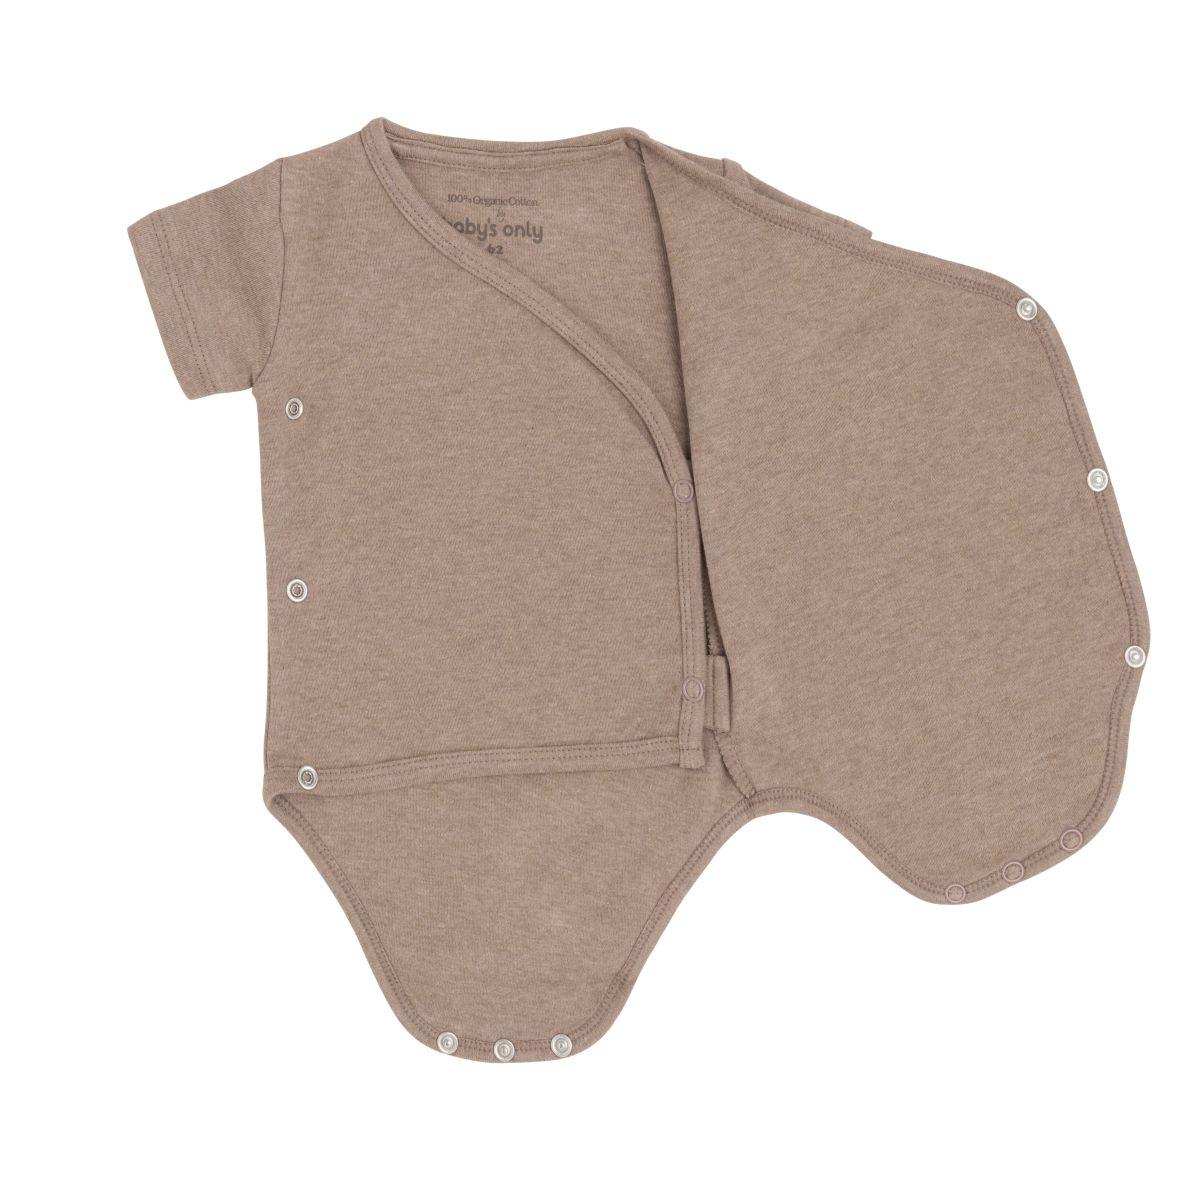 babys only bo340336041 melange rompertje clay 2